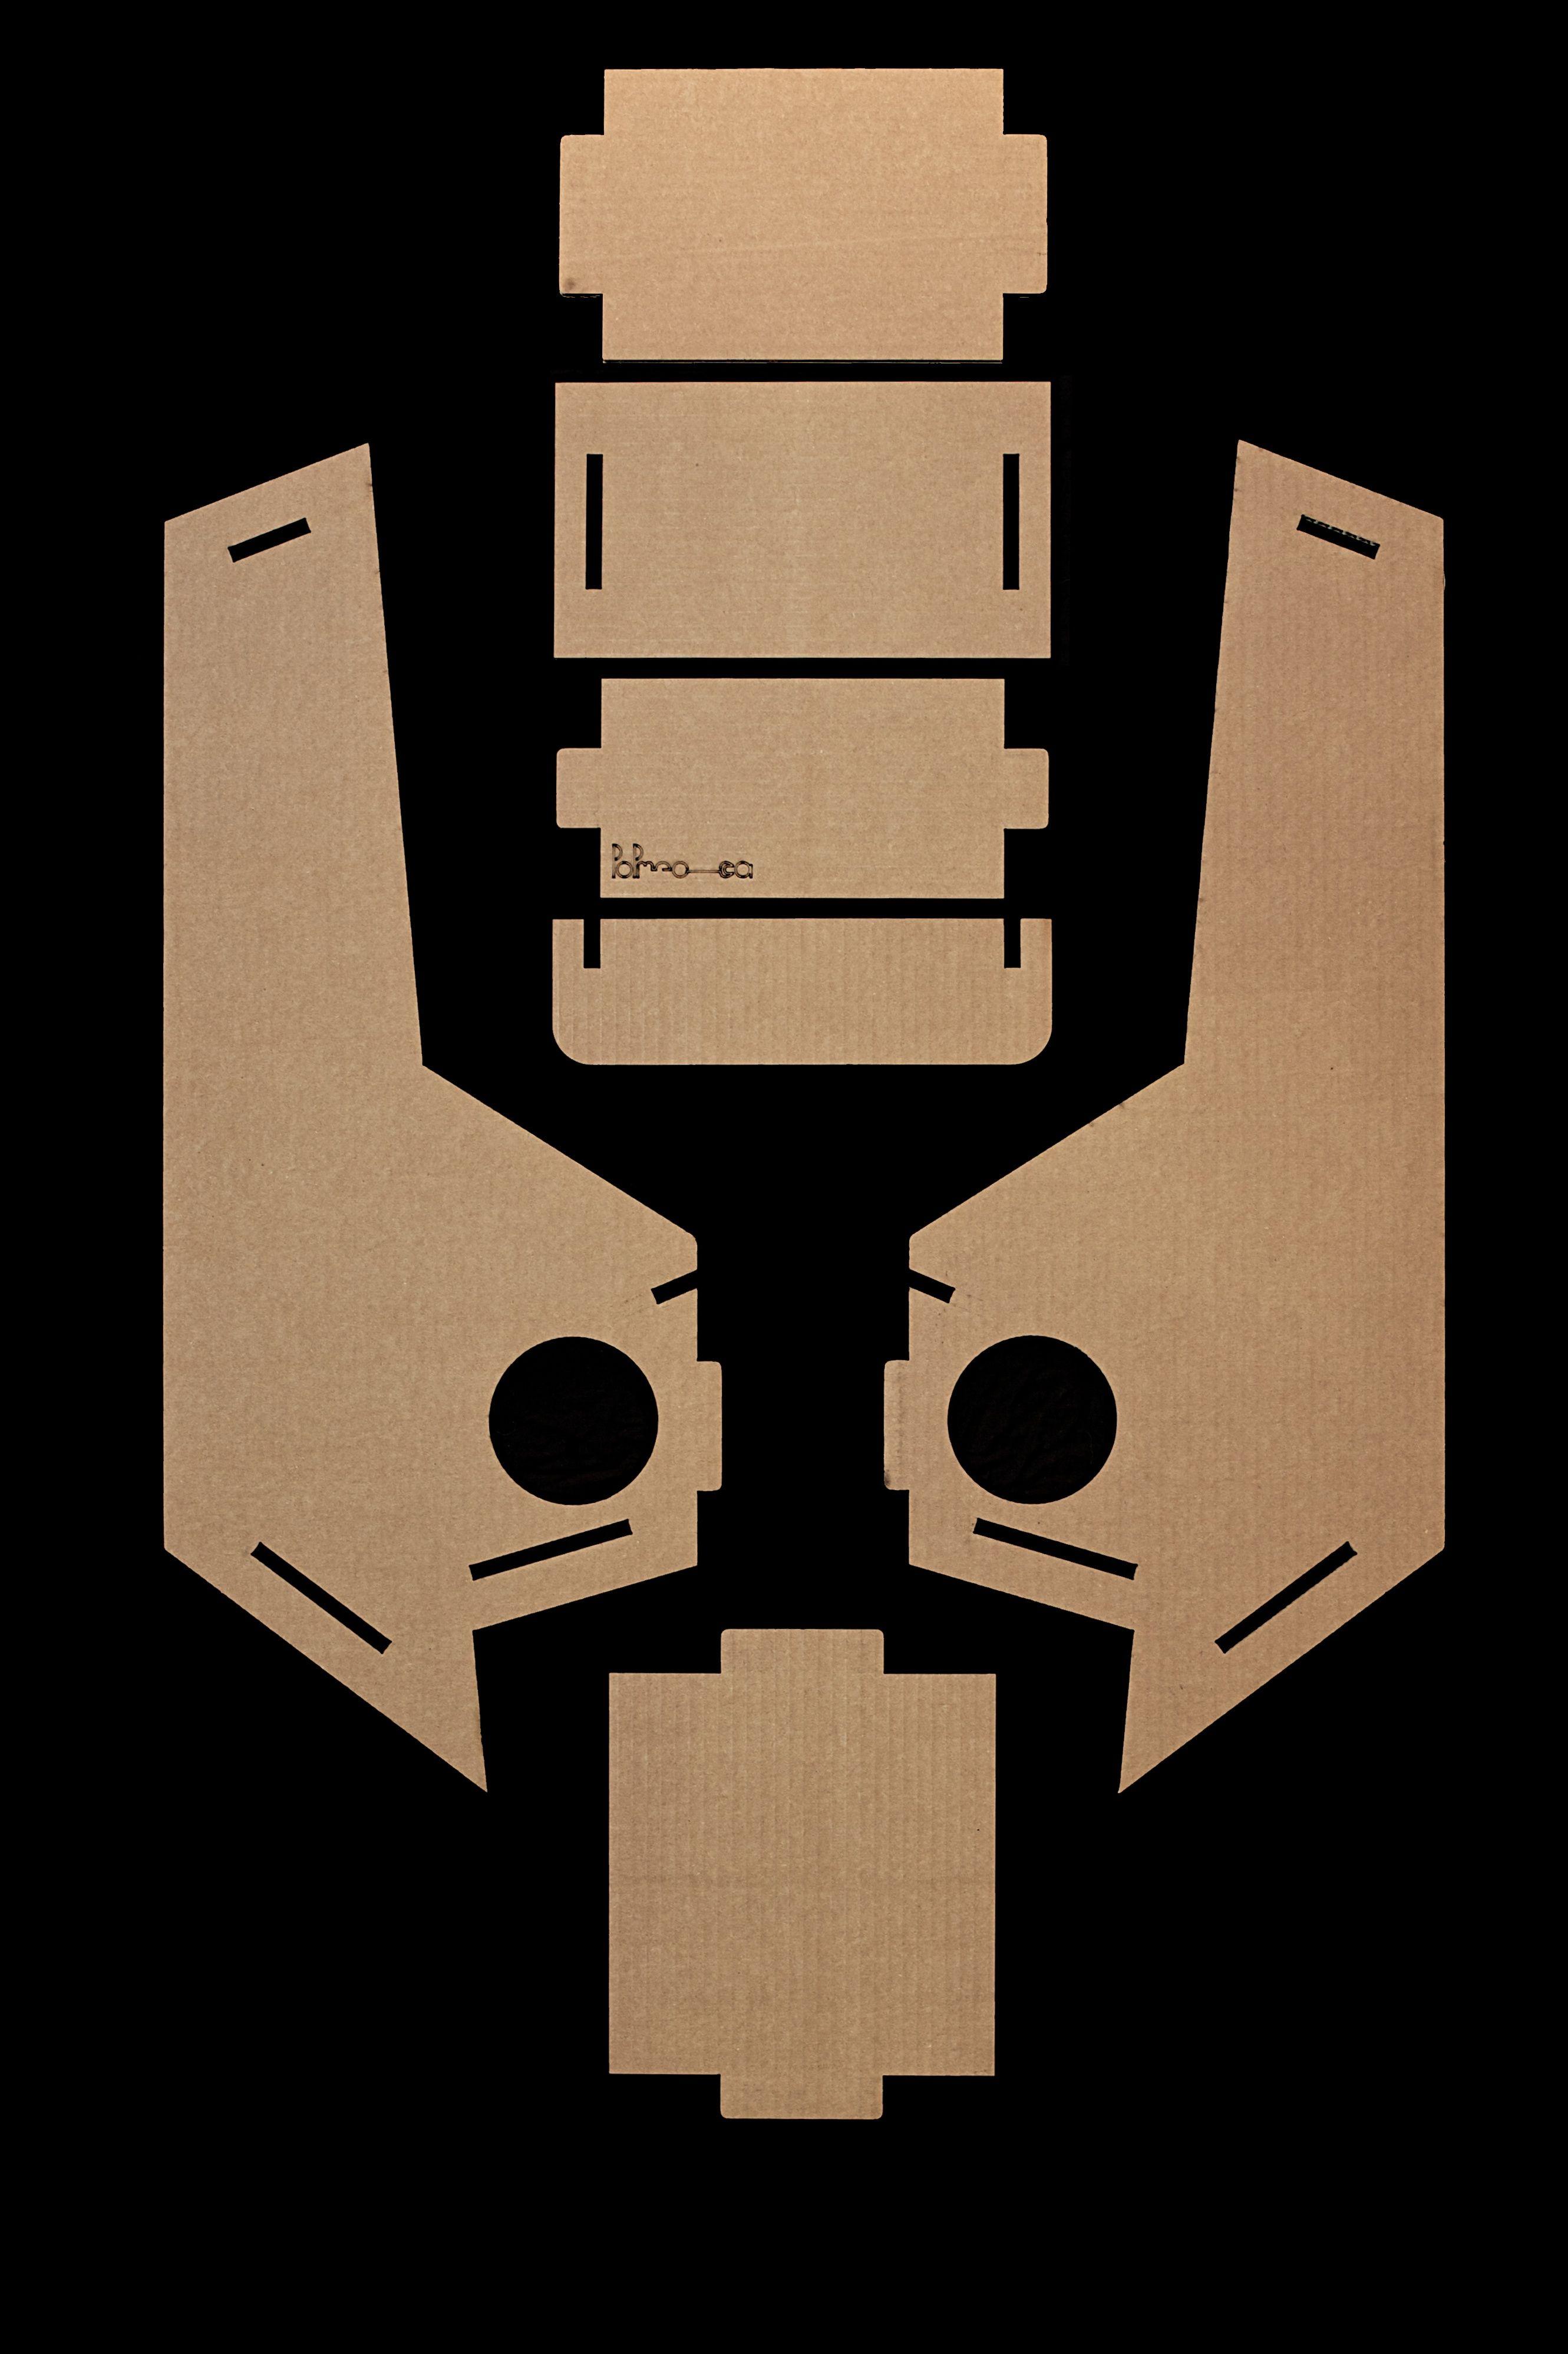 Gioco o test di rorschach cardboard furniture paper crafts design crafts - Test di rorschach tavola 1 ...